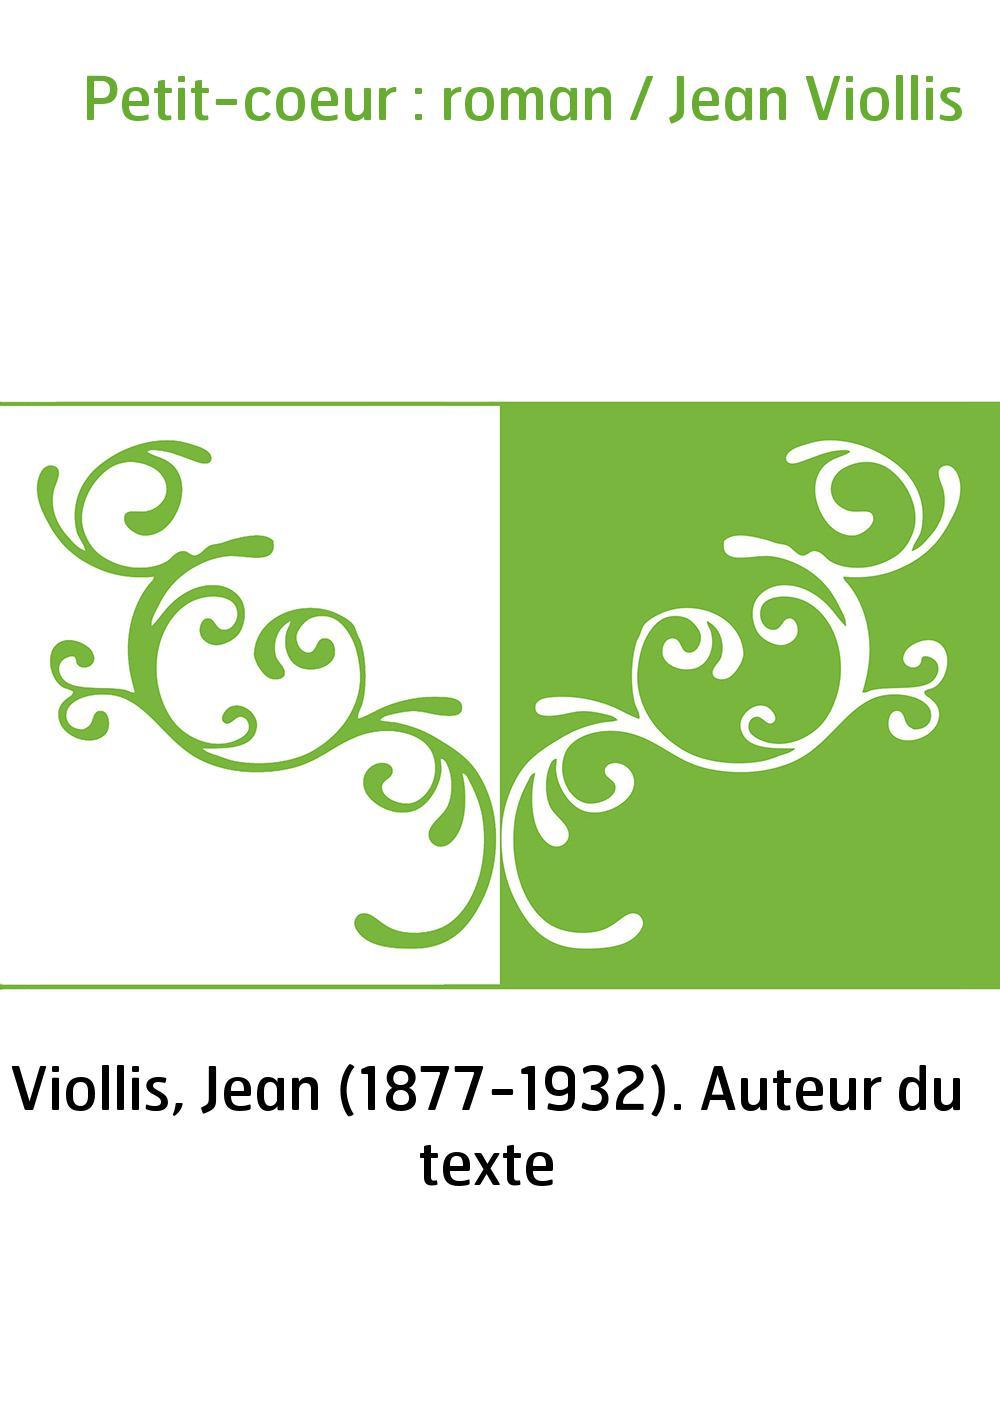 Petit-coeur : roman / Jean Viollis